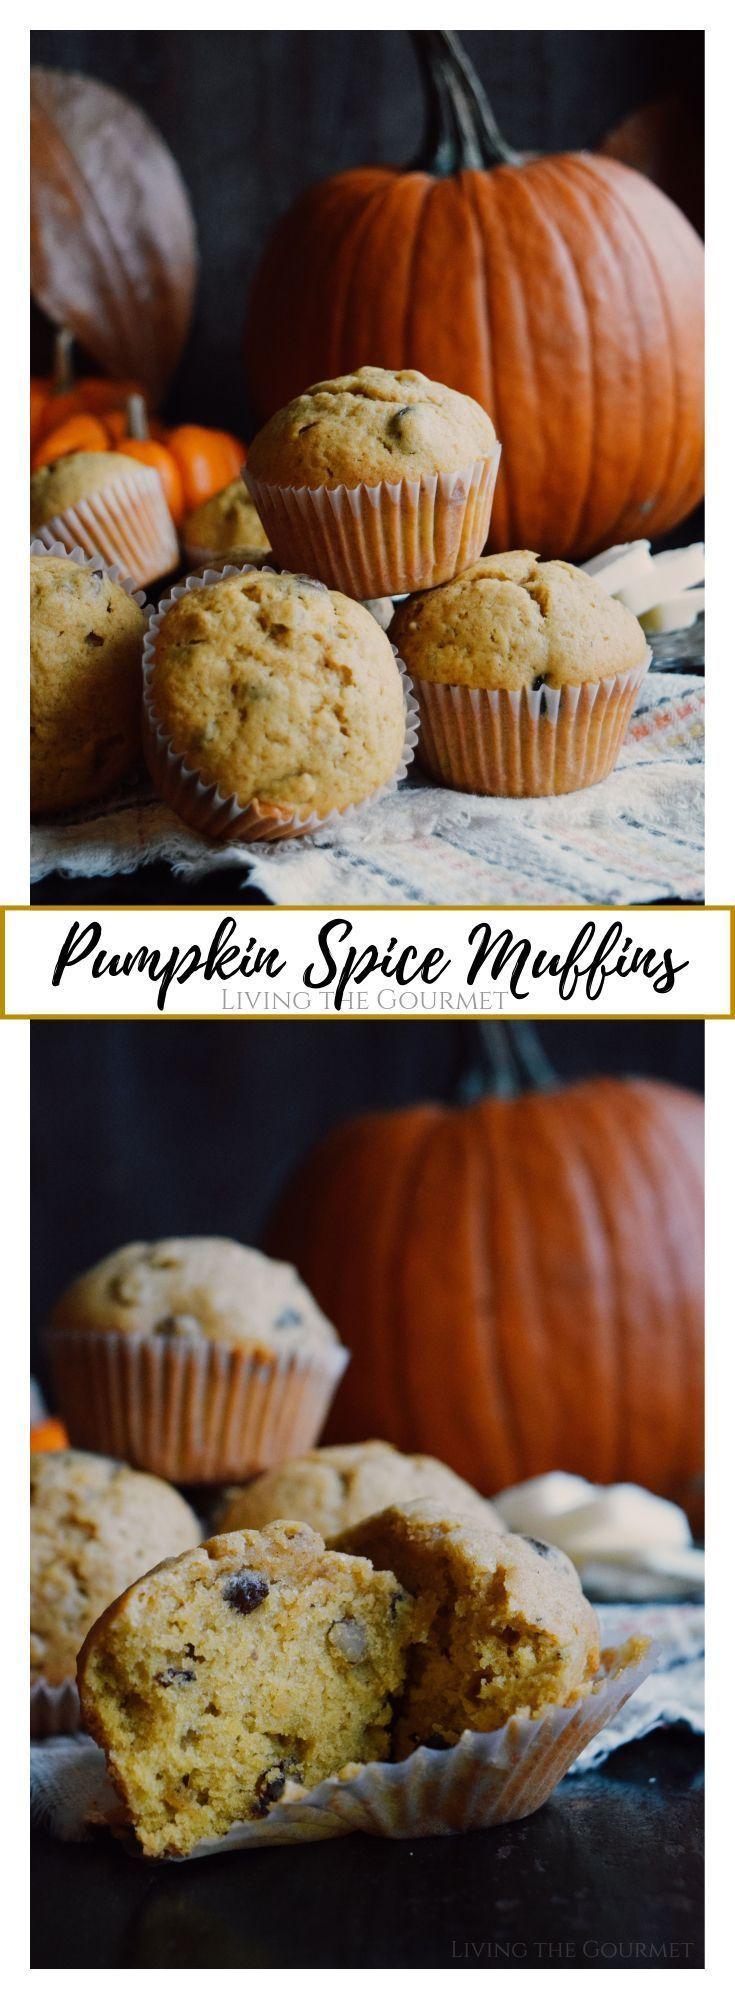 Pumpkin Spice Muffins #pumpkinspicecupcakes Pumpkin Spice Muffins - Living The Gourmet #pumpkinspicecupcakes Pumpkin Spice Muffins #pumpkinspicecupcakes Pumpkin Spice Muffins - Living The Gourmet #pumpkinspicecupcakes